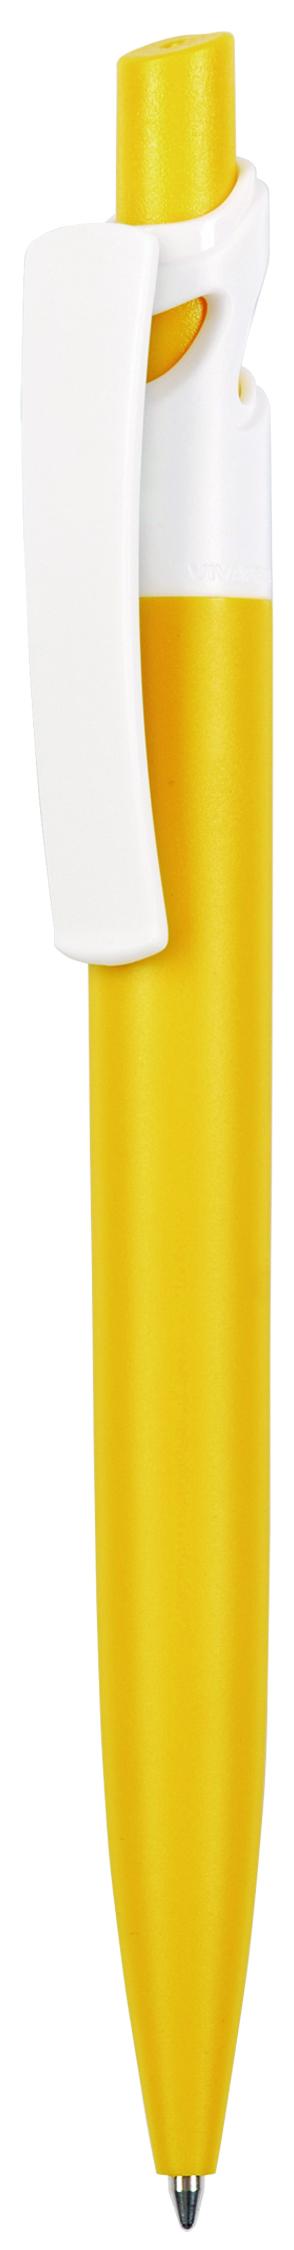 MAXX_SOLID_yellow